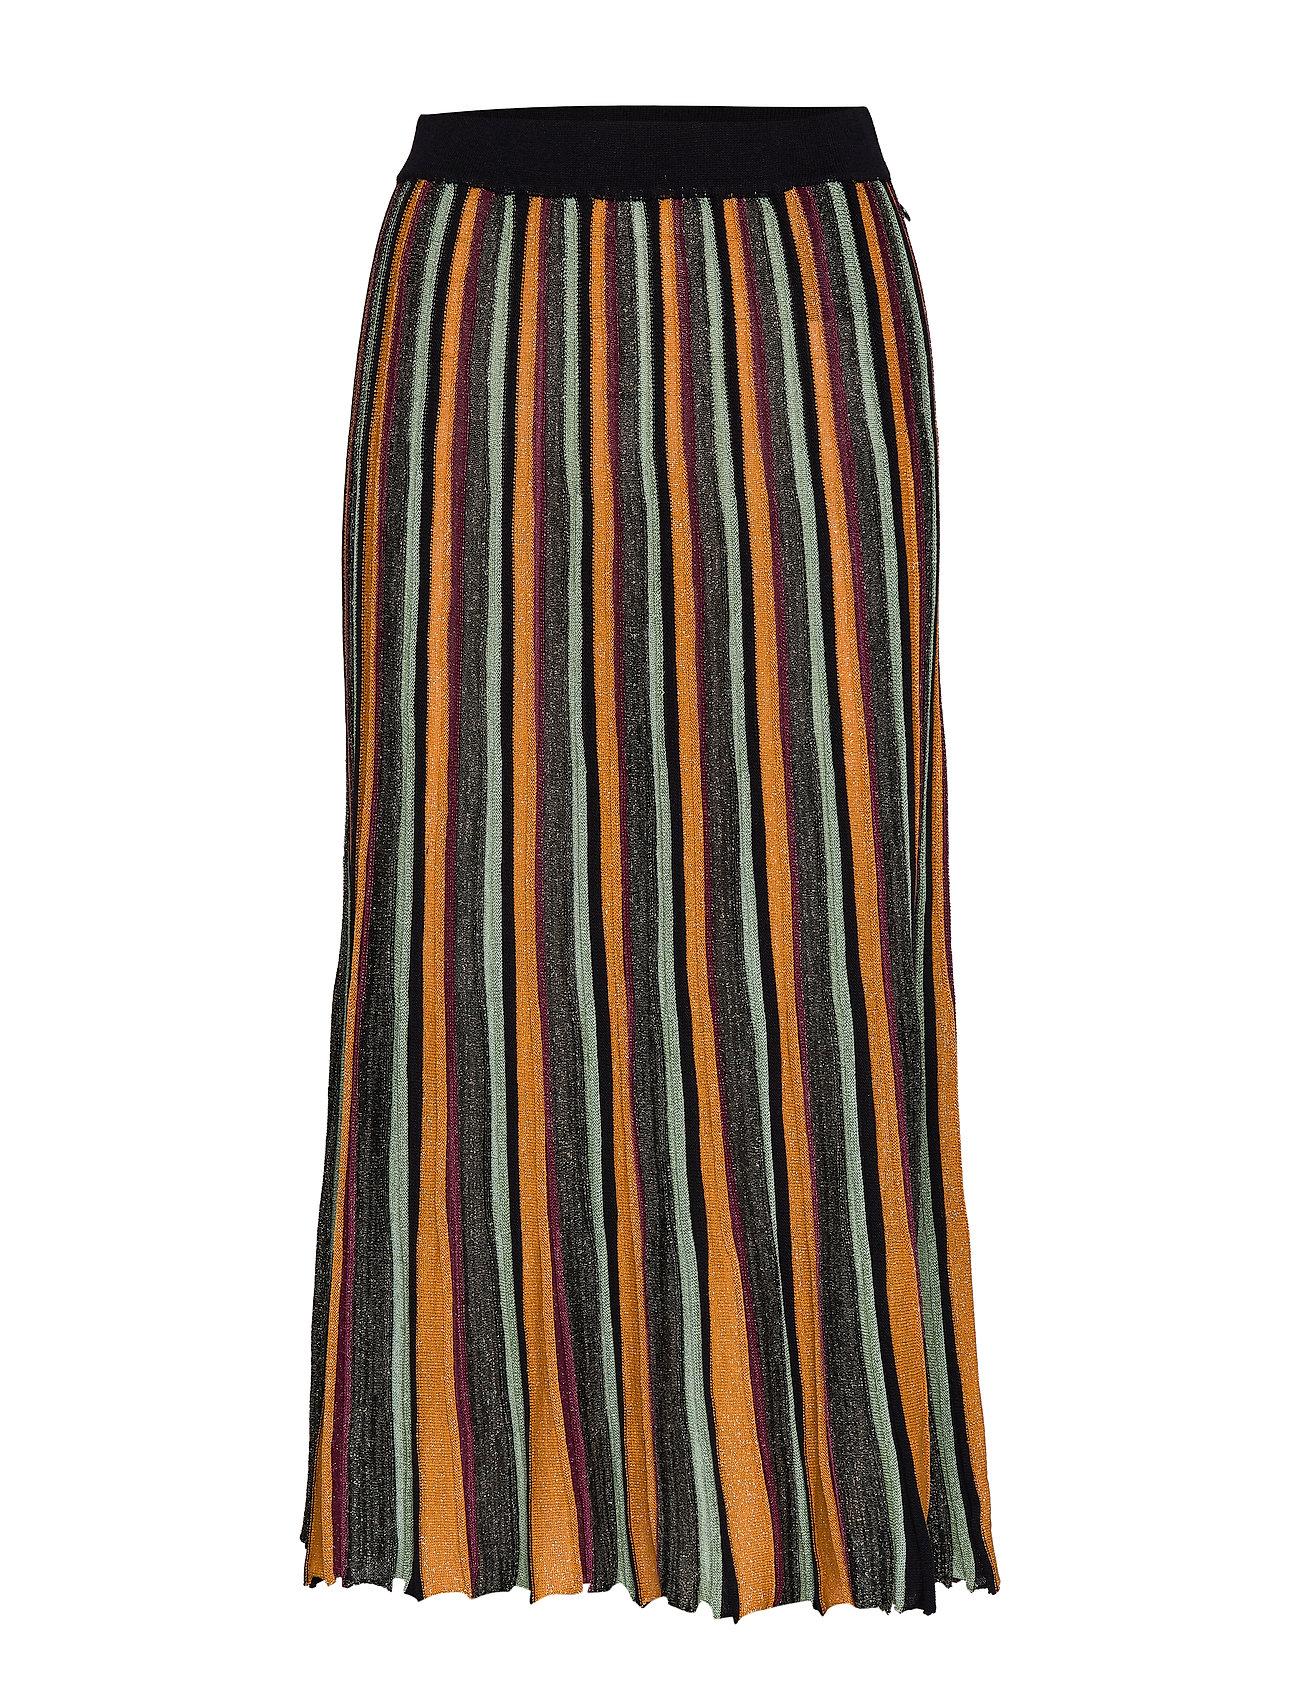 Scotch & Soda Pleated midi length skirt in multicolour lurex stripe - COMBO W